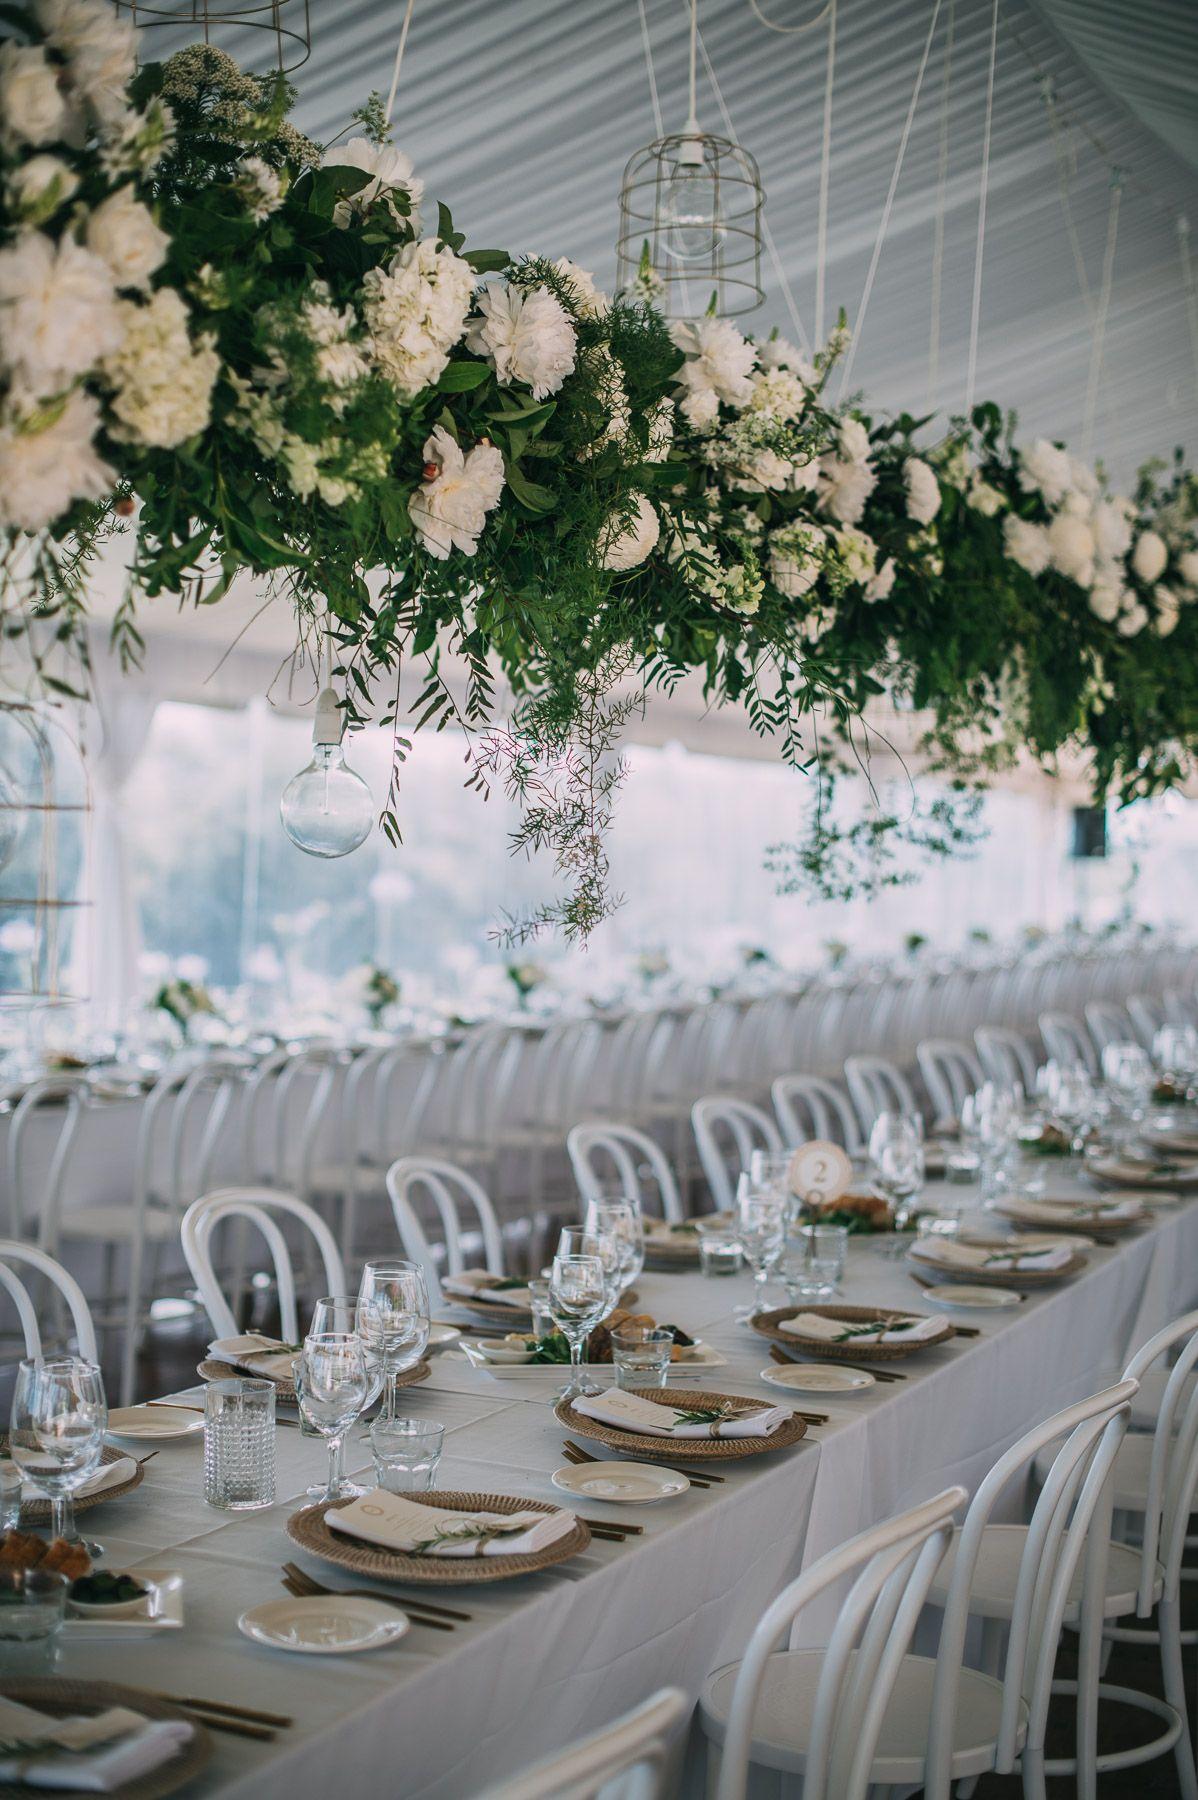 Wedding reception white bentwood chairs hanging florals wedding reception white bentwood chairs hanging florals hampton event hire lucas junglespirit Choice Image